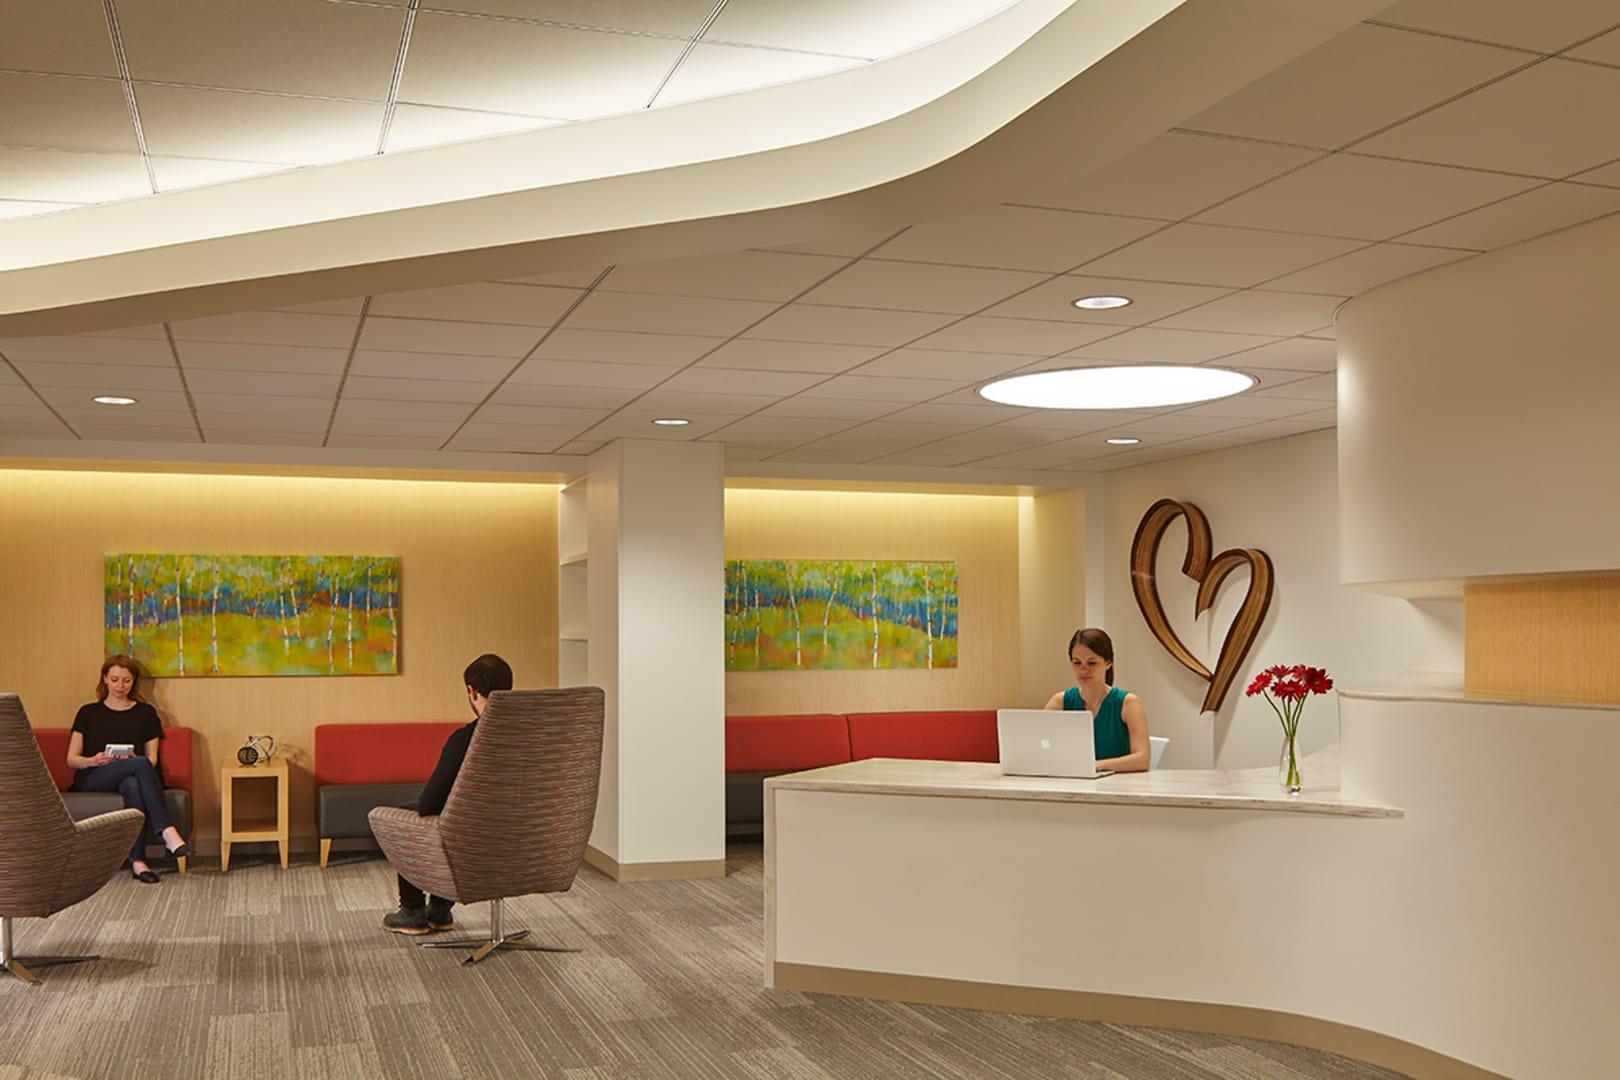 Advocate Lutheran General Hospital Cardiac Catheterization Suite